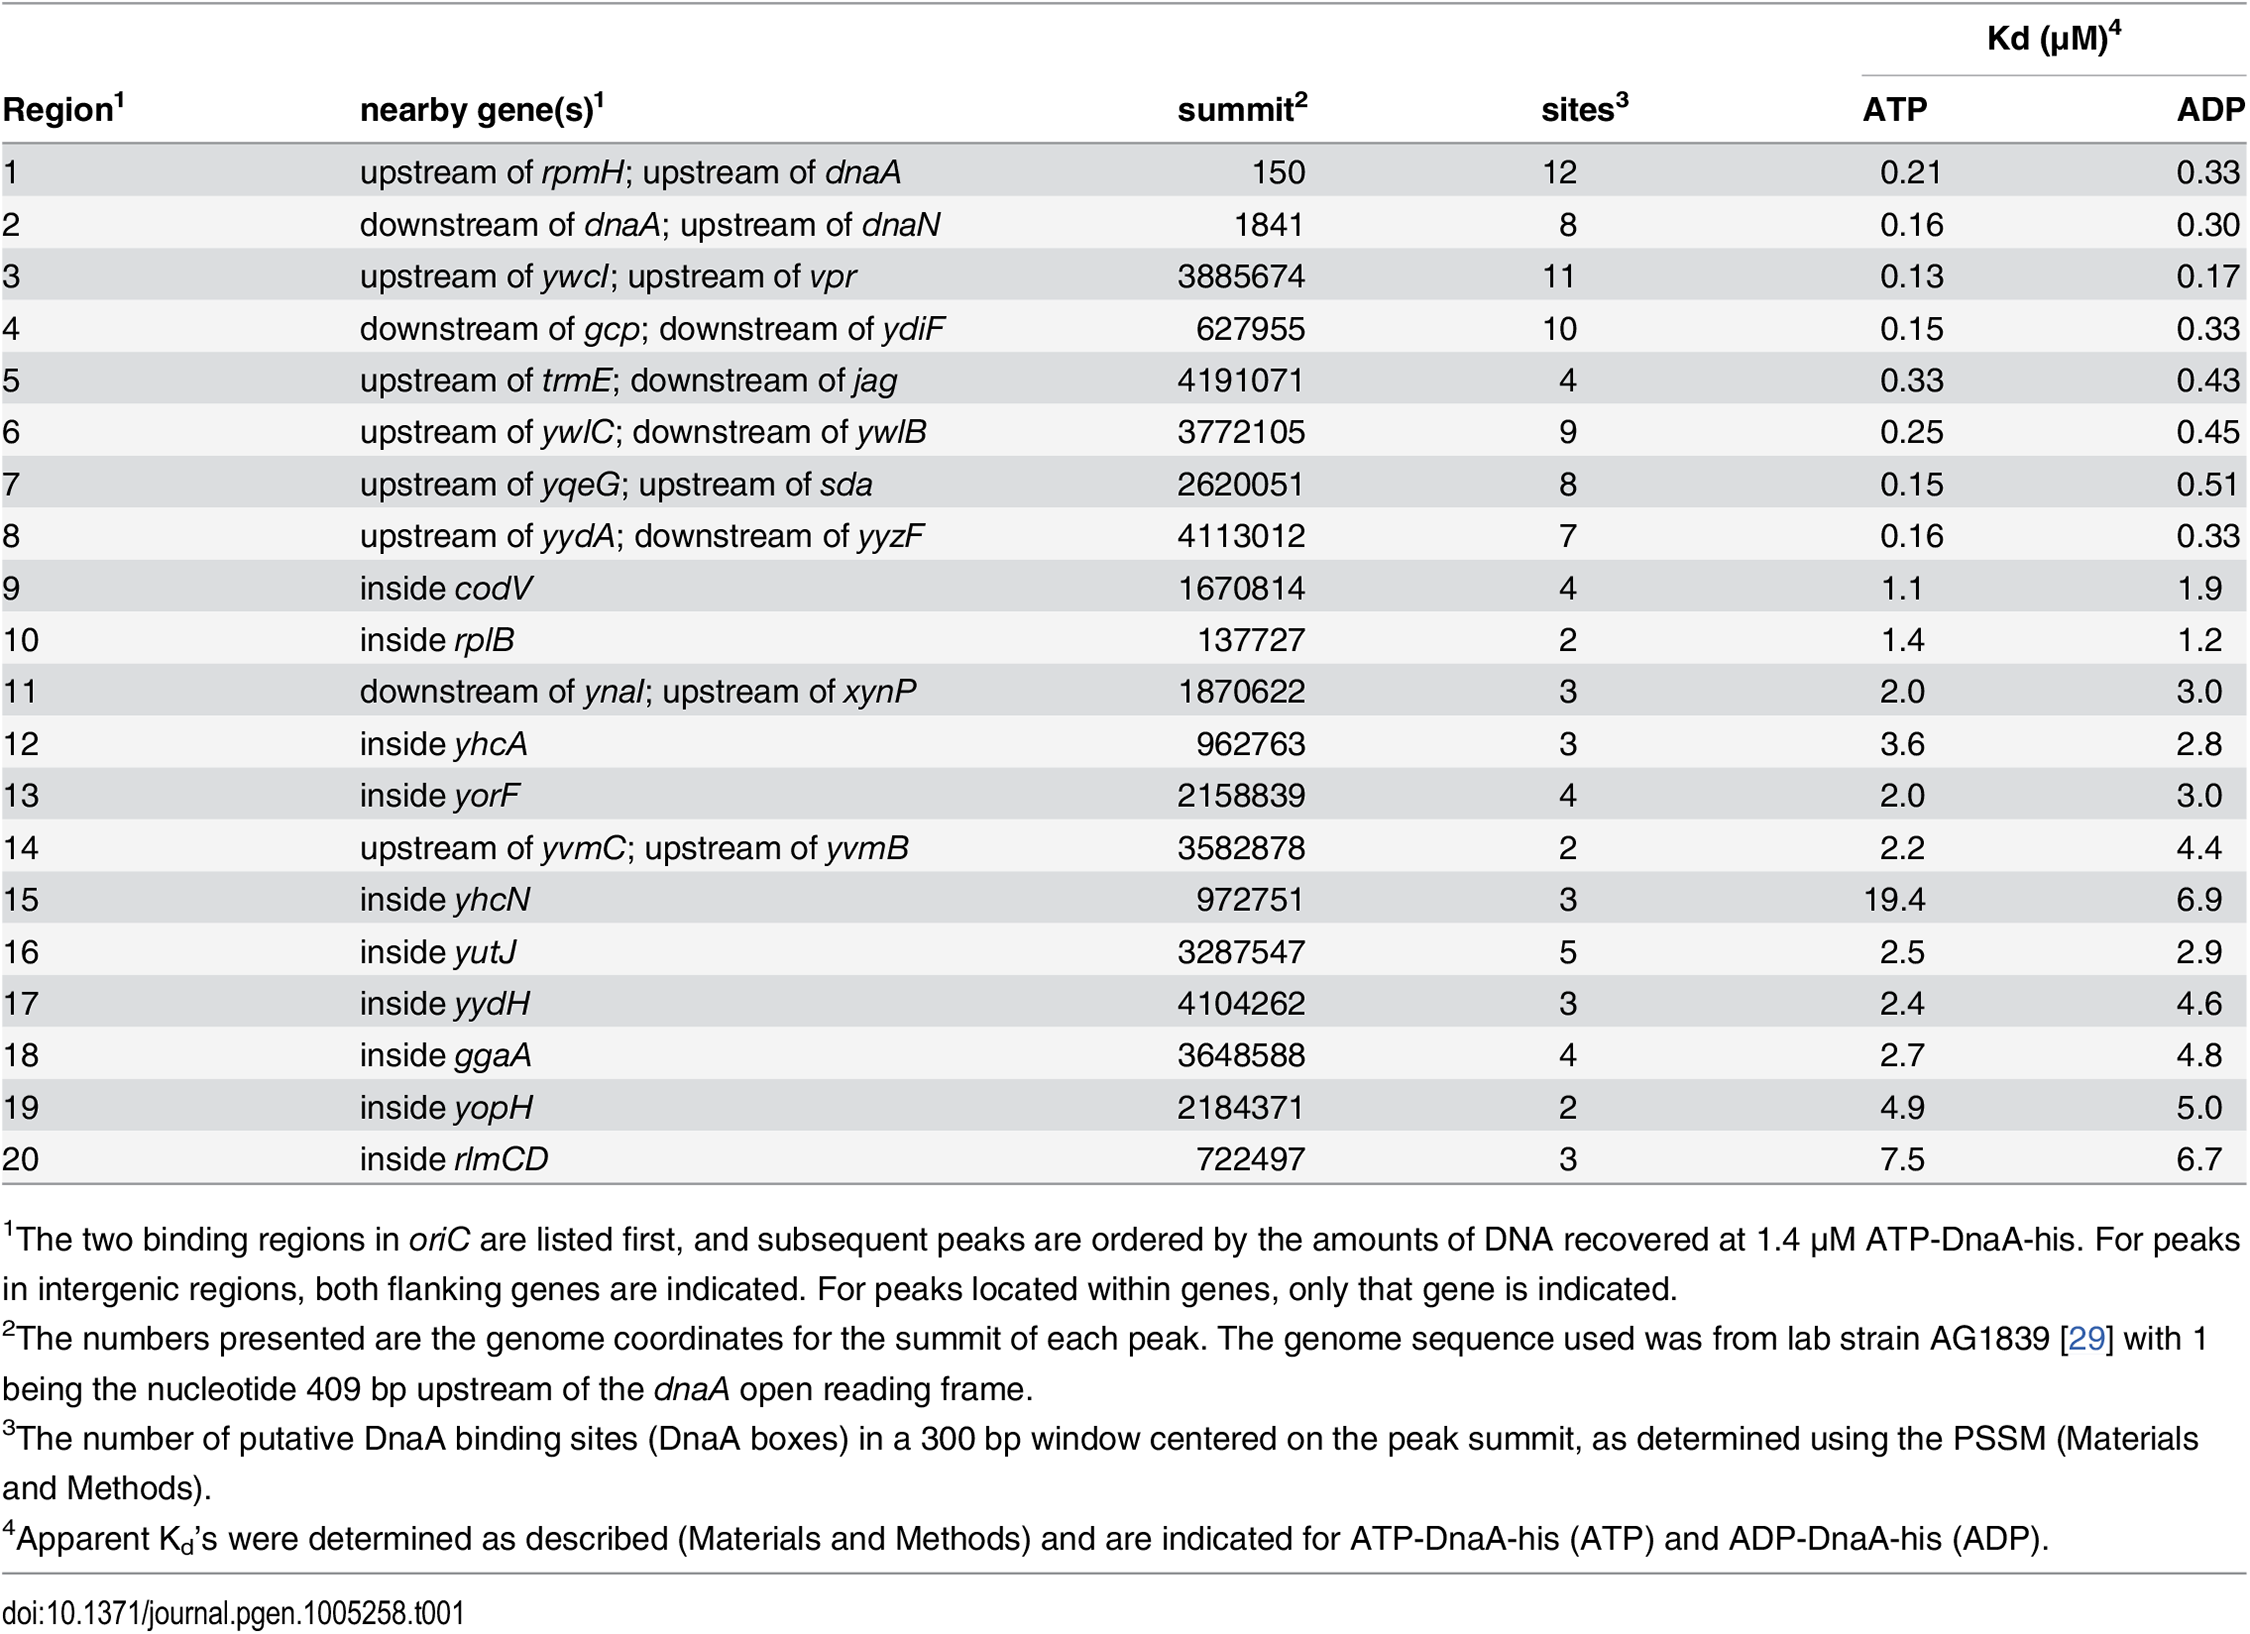 Top 20 DnaA binding regions <i>in vitro</i>.